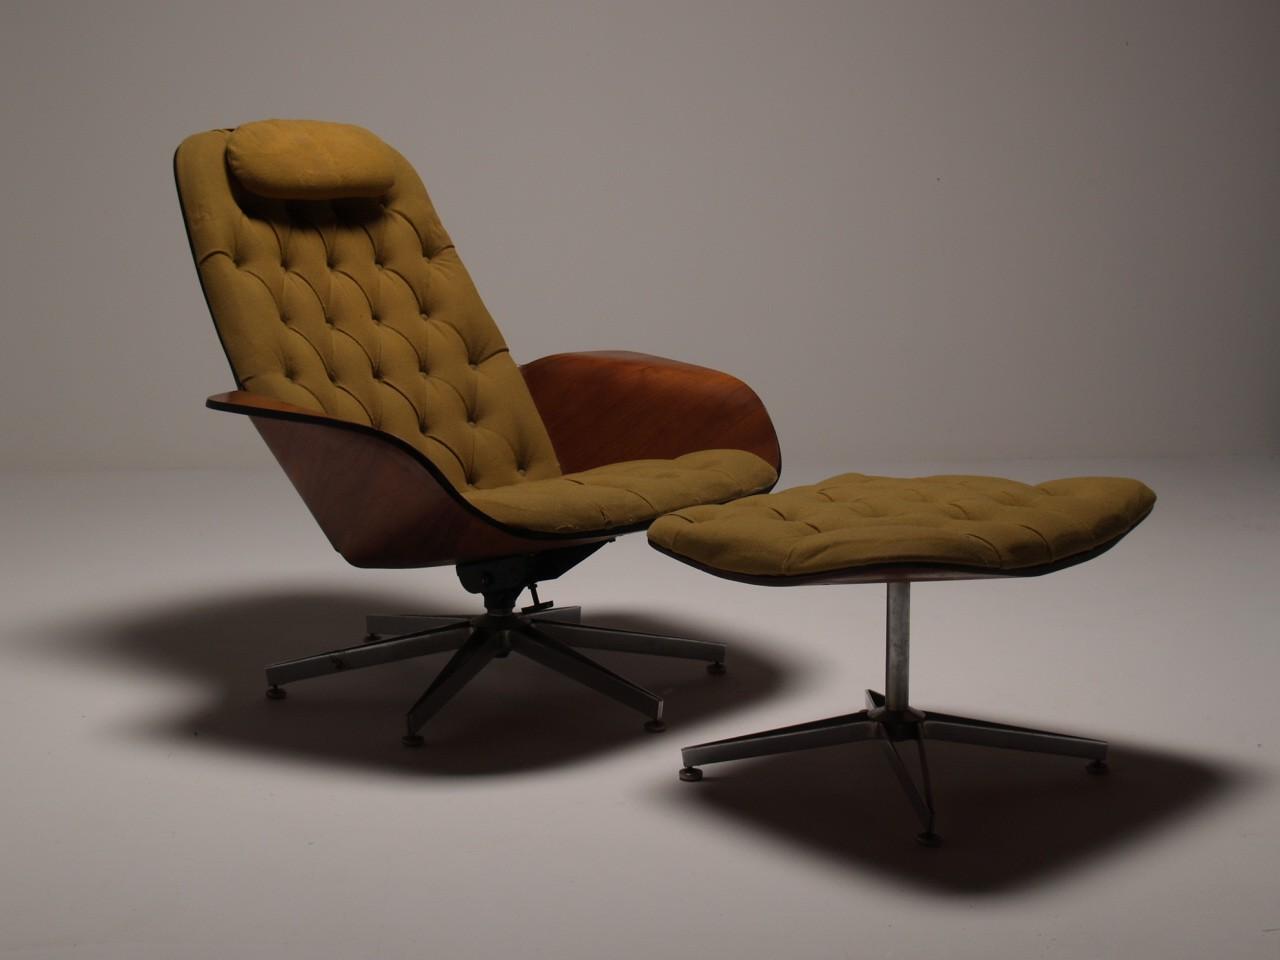 vintage design chair  The Good Old Dayz